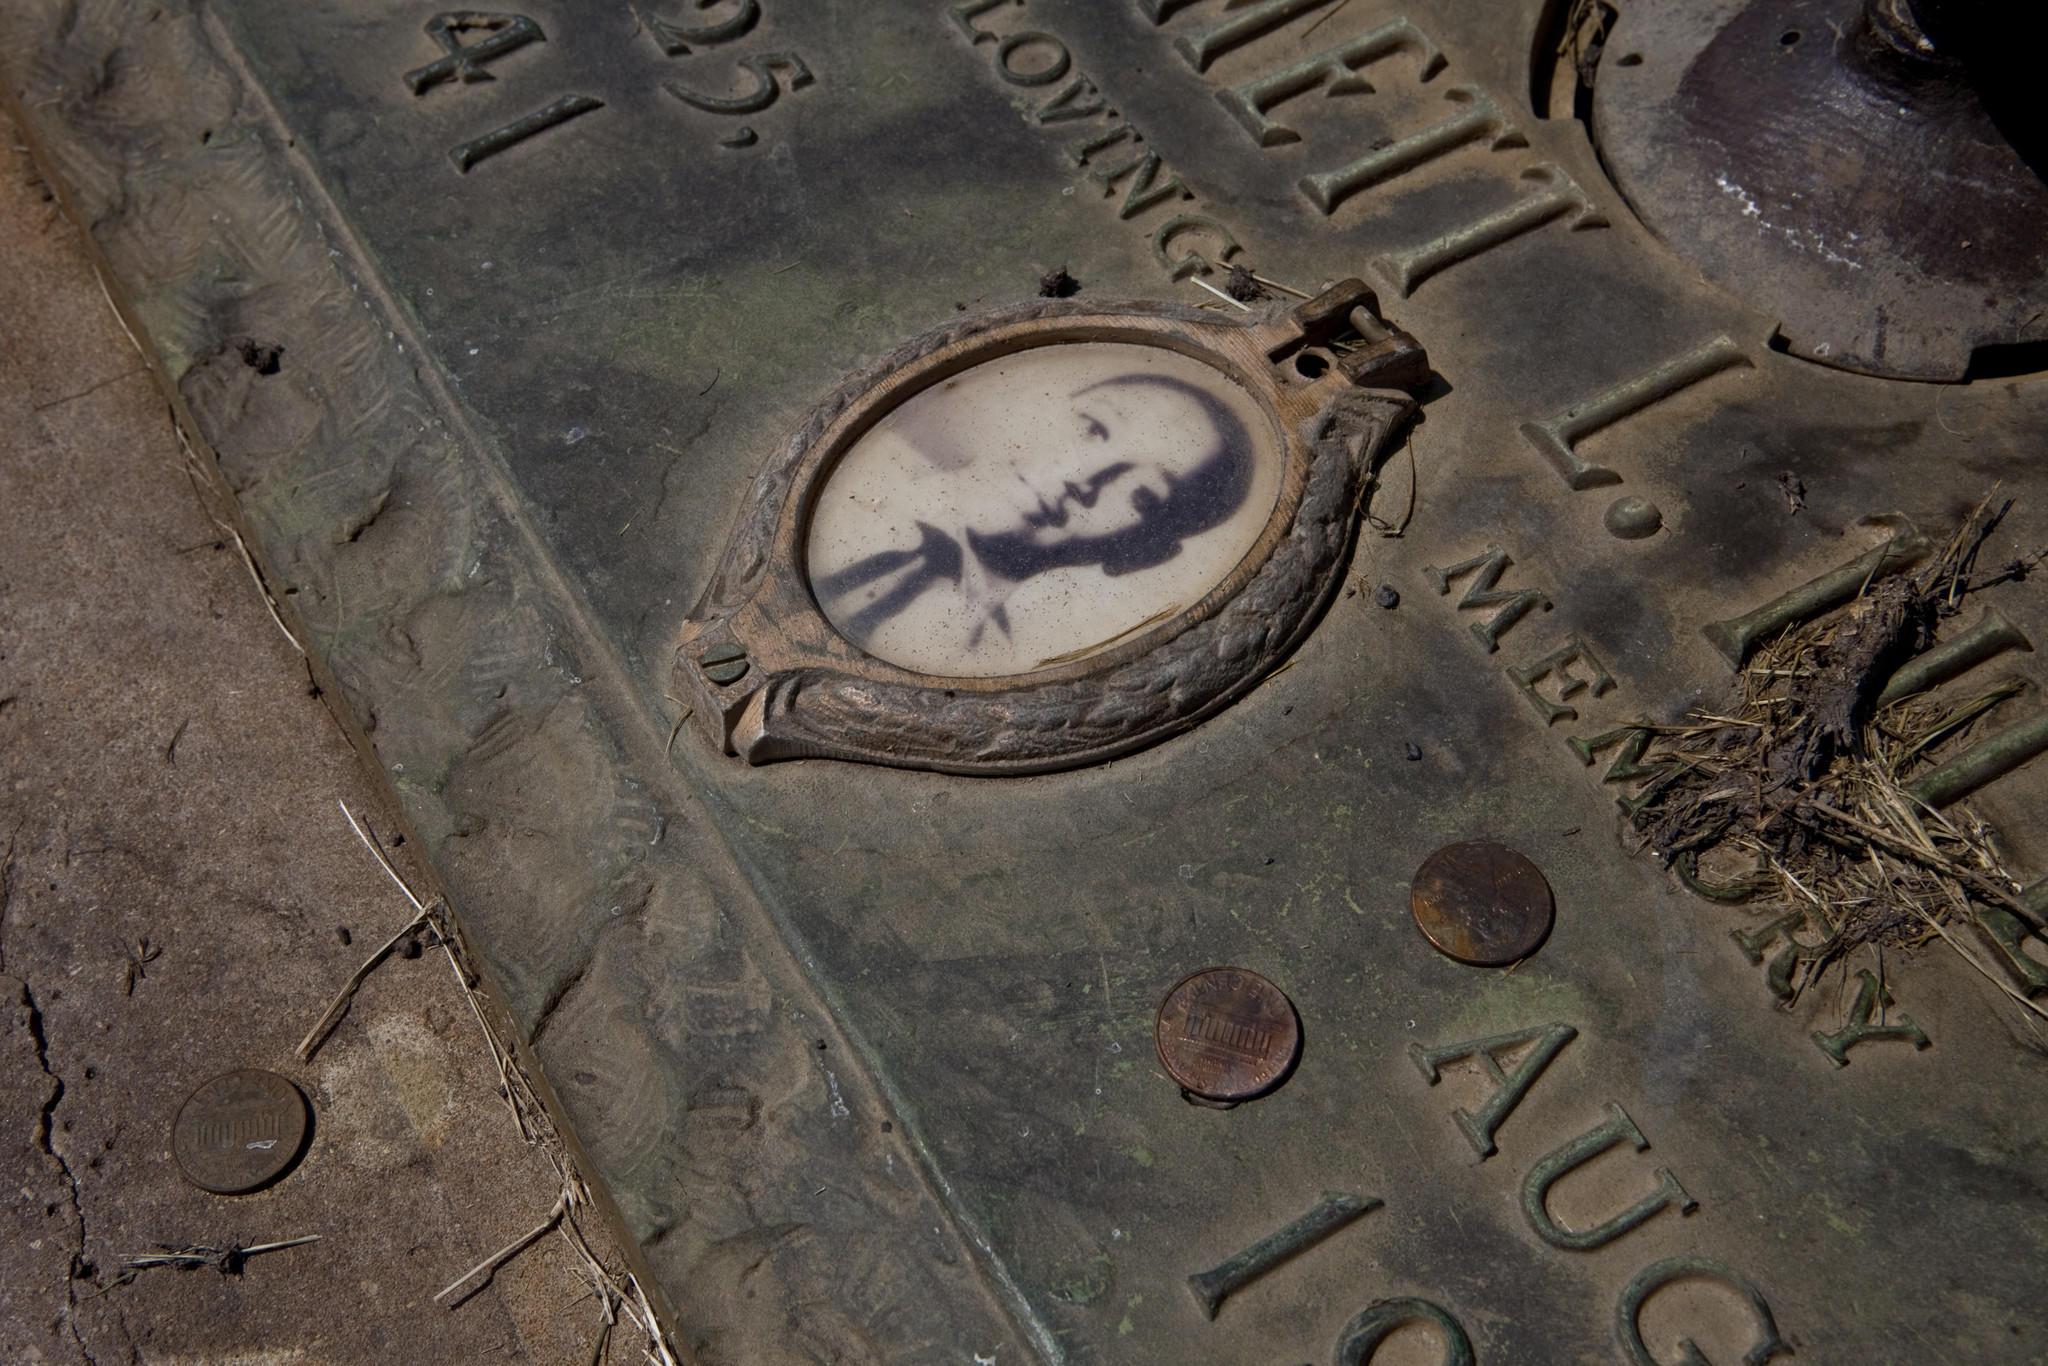 A grave of Emmett Till at the Burr Oak cemetery in Alsip.